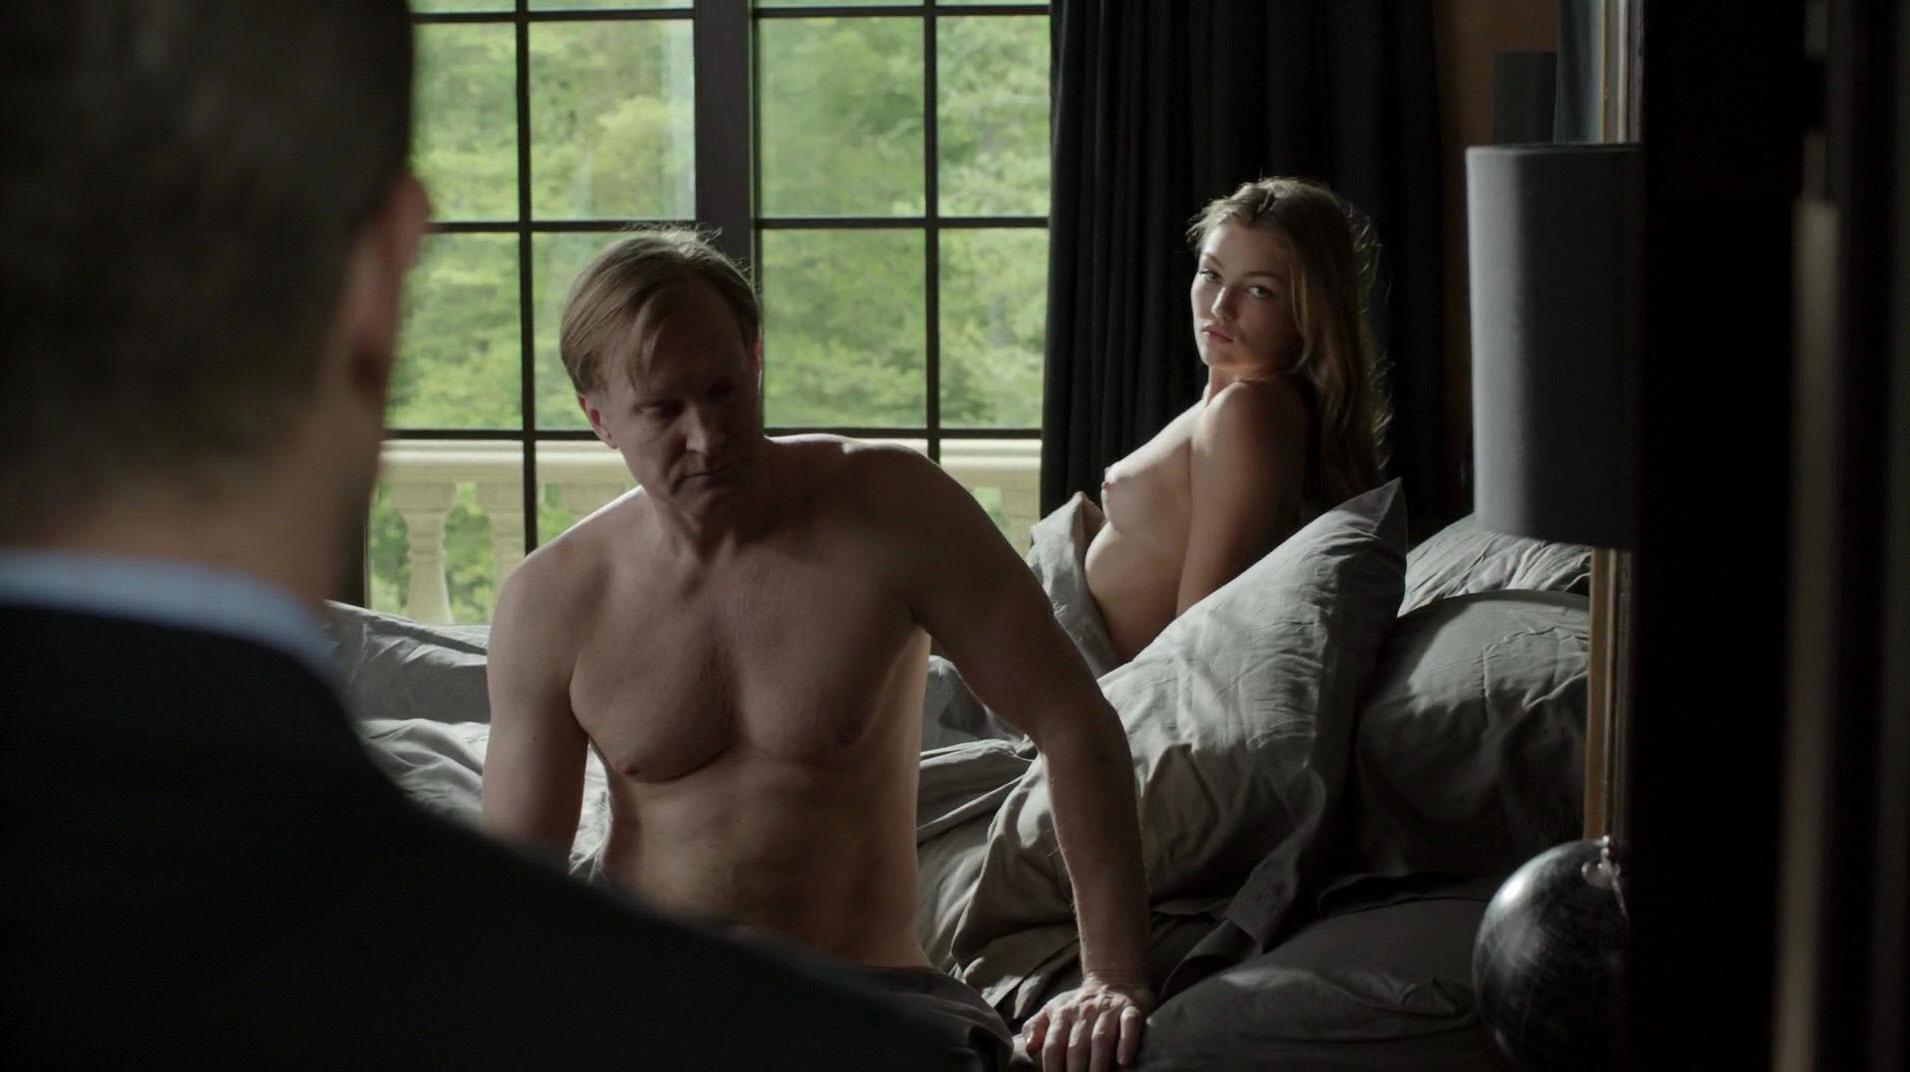 Lili Simmons nude - Banshee s03e01 (2015)